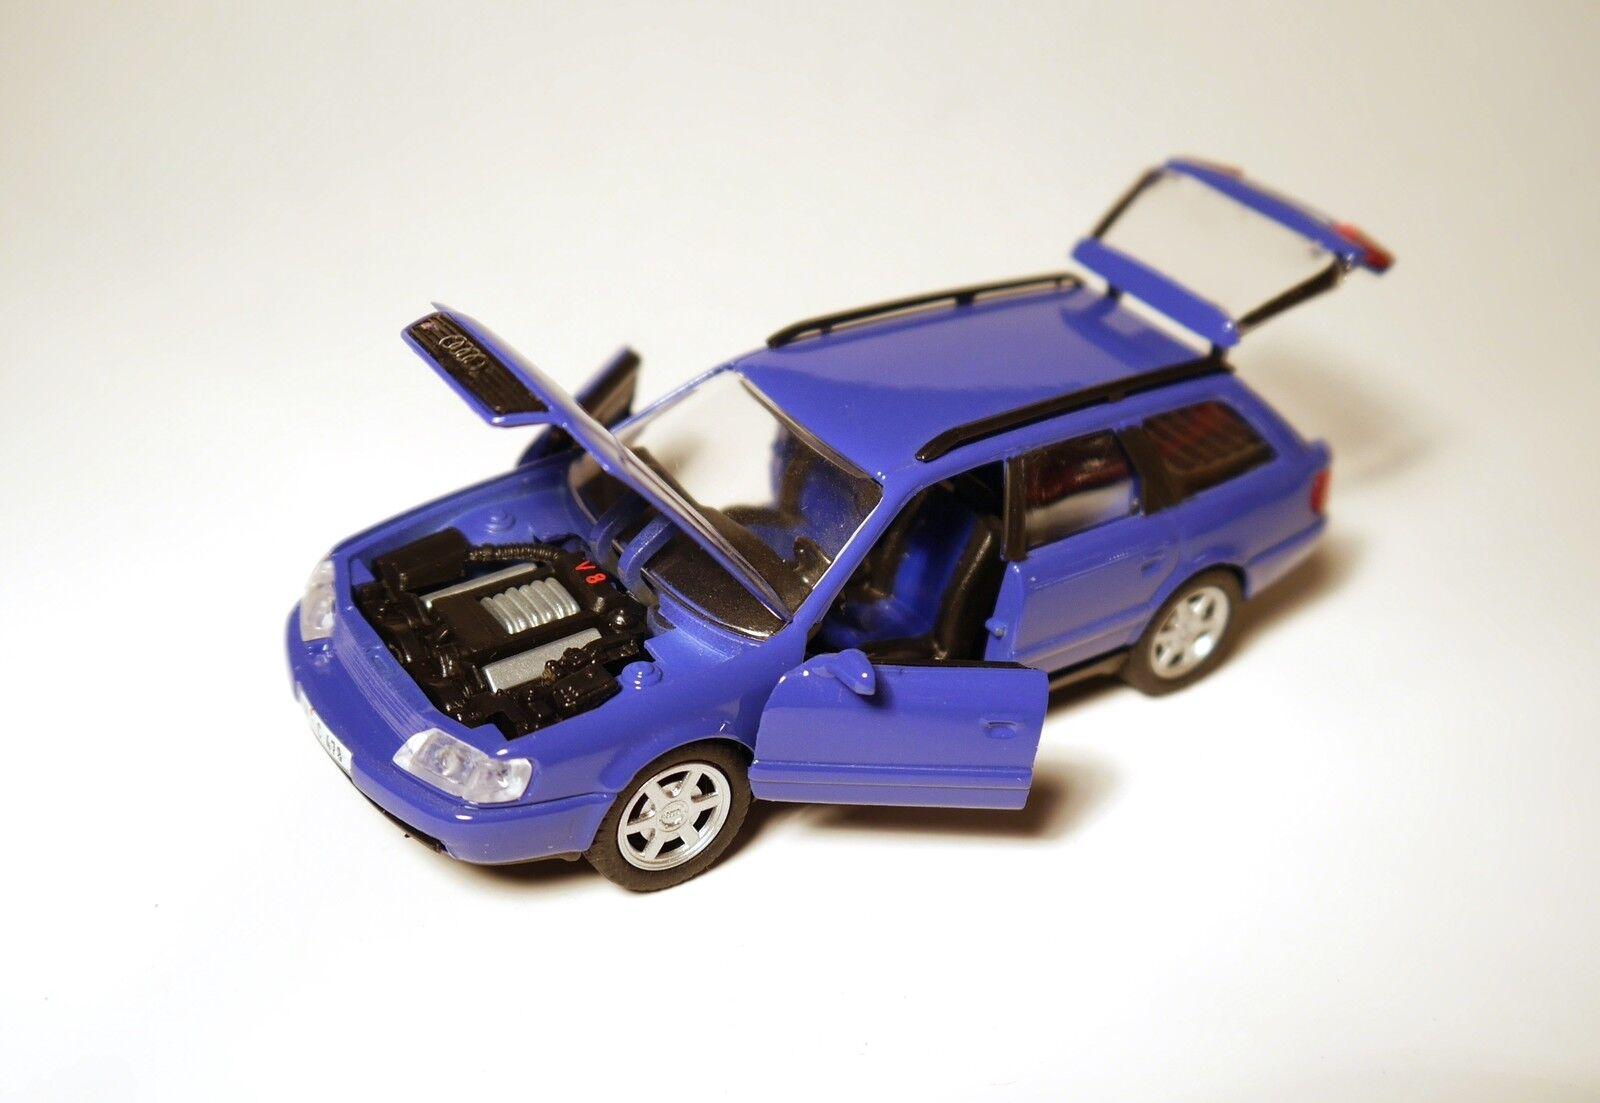 Audi S6 Plus Plus Plus Avant in nagaro blau Blau Blau Blau, Schabak in 1 43 - SOLO  | Perfekt In Verarbeitung  db2aac